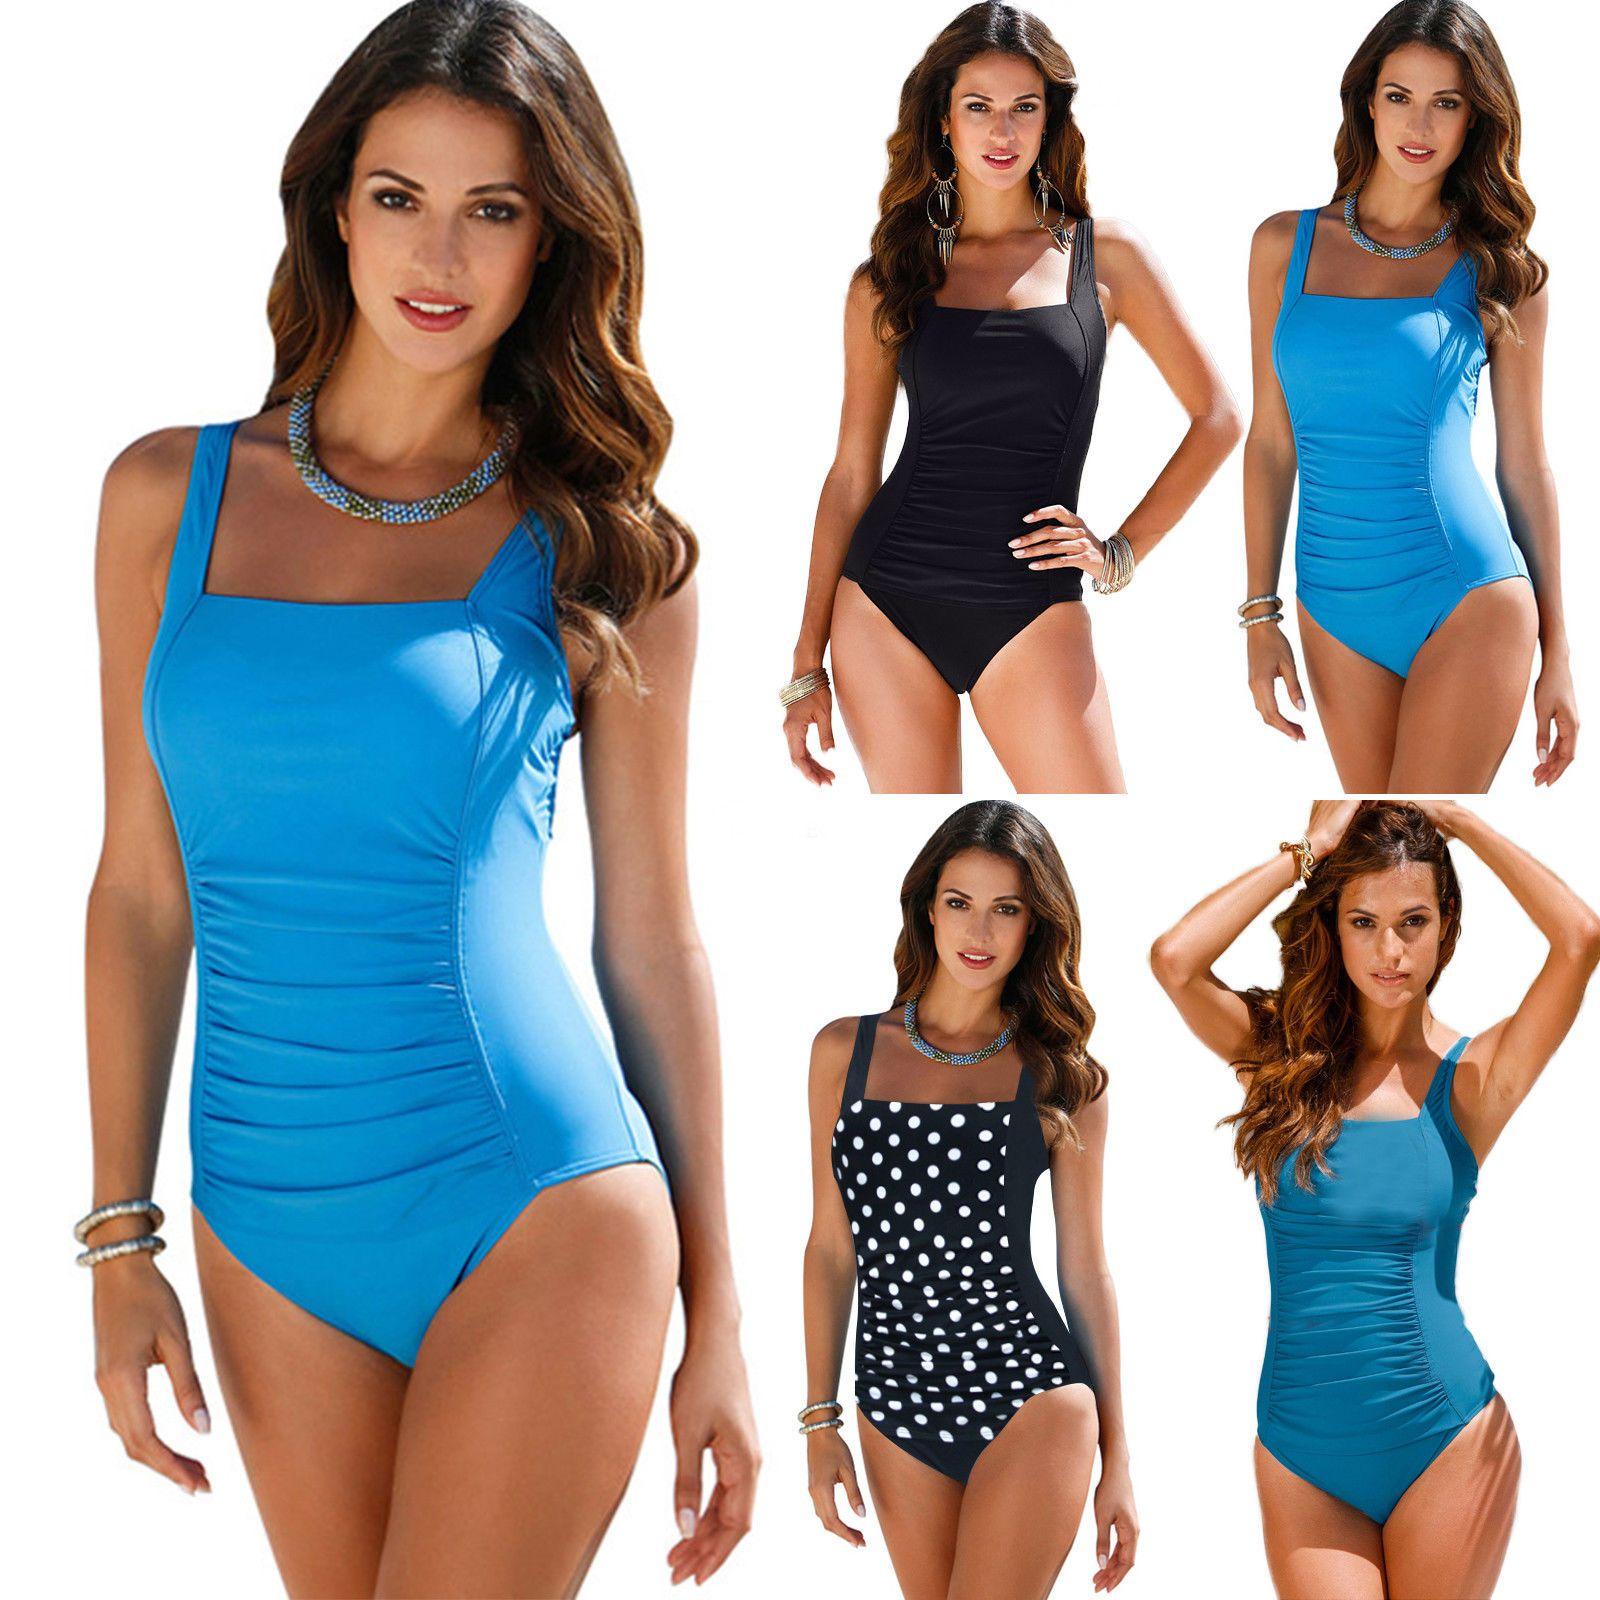 2cb9c232236 2019 US FAST SHIPPING 2018 Women One Piece Monokini Push Up Bikini Swimwear  Swimsuit Padded Bathing Suit Plus Size From Plazahere, $12.57 | DHgate.Com